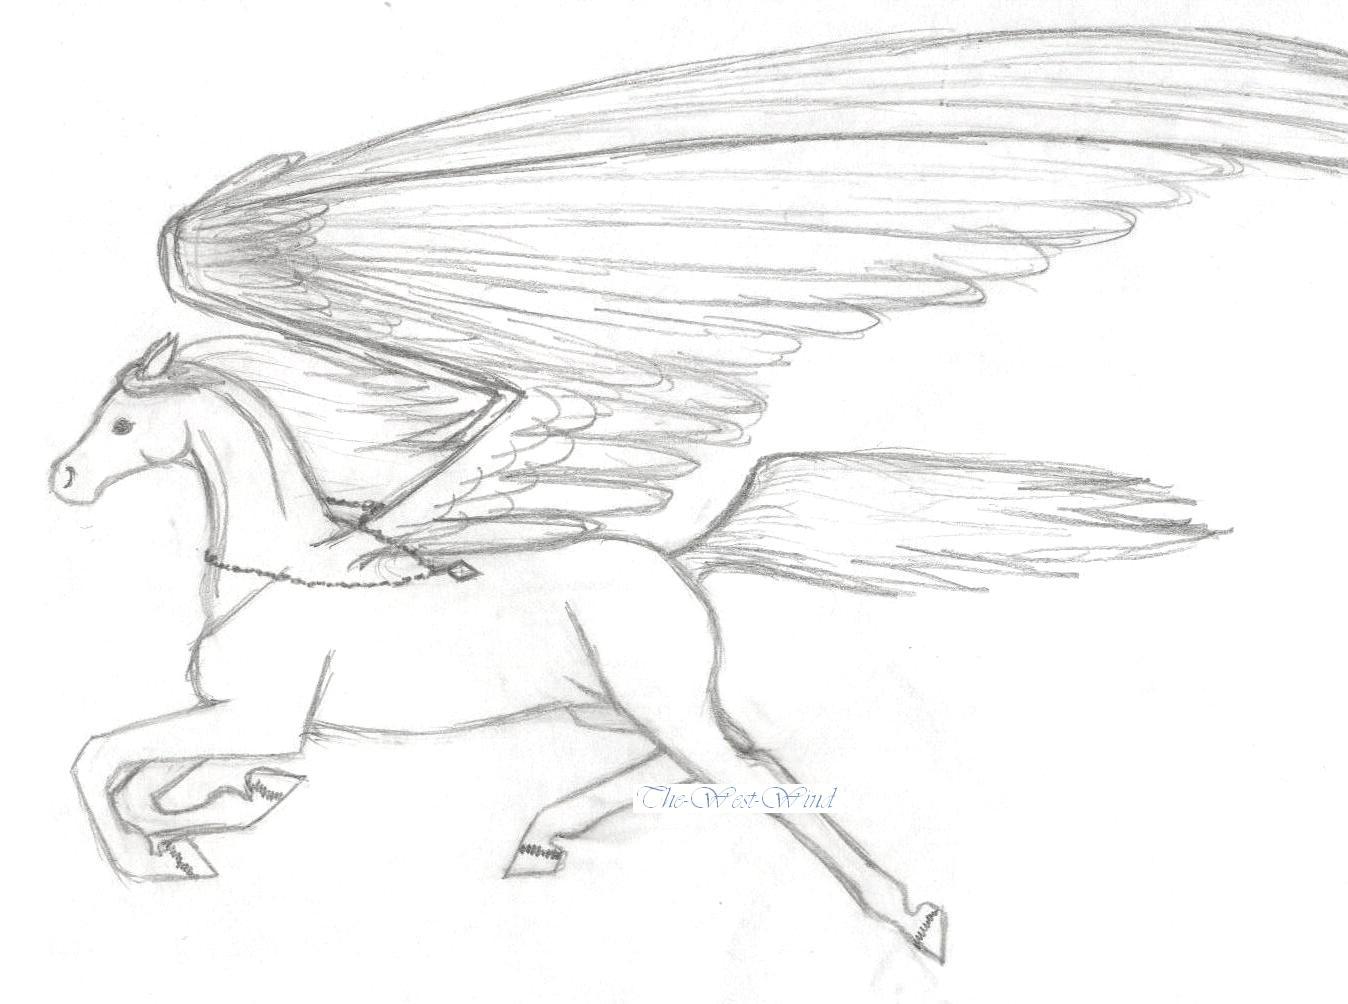 Uncategorized Drawings Of Pegasus pegasus 1 mid flight by the west wind on deviantart wind